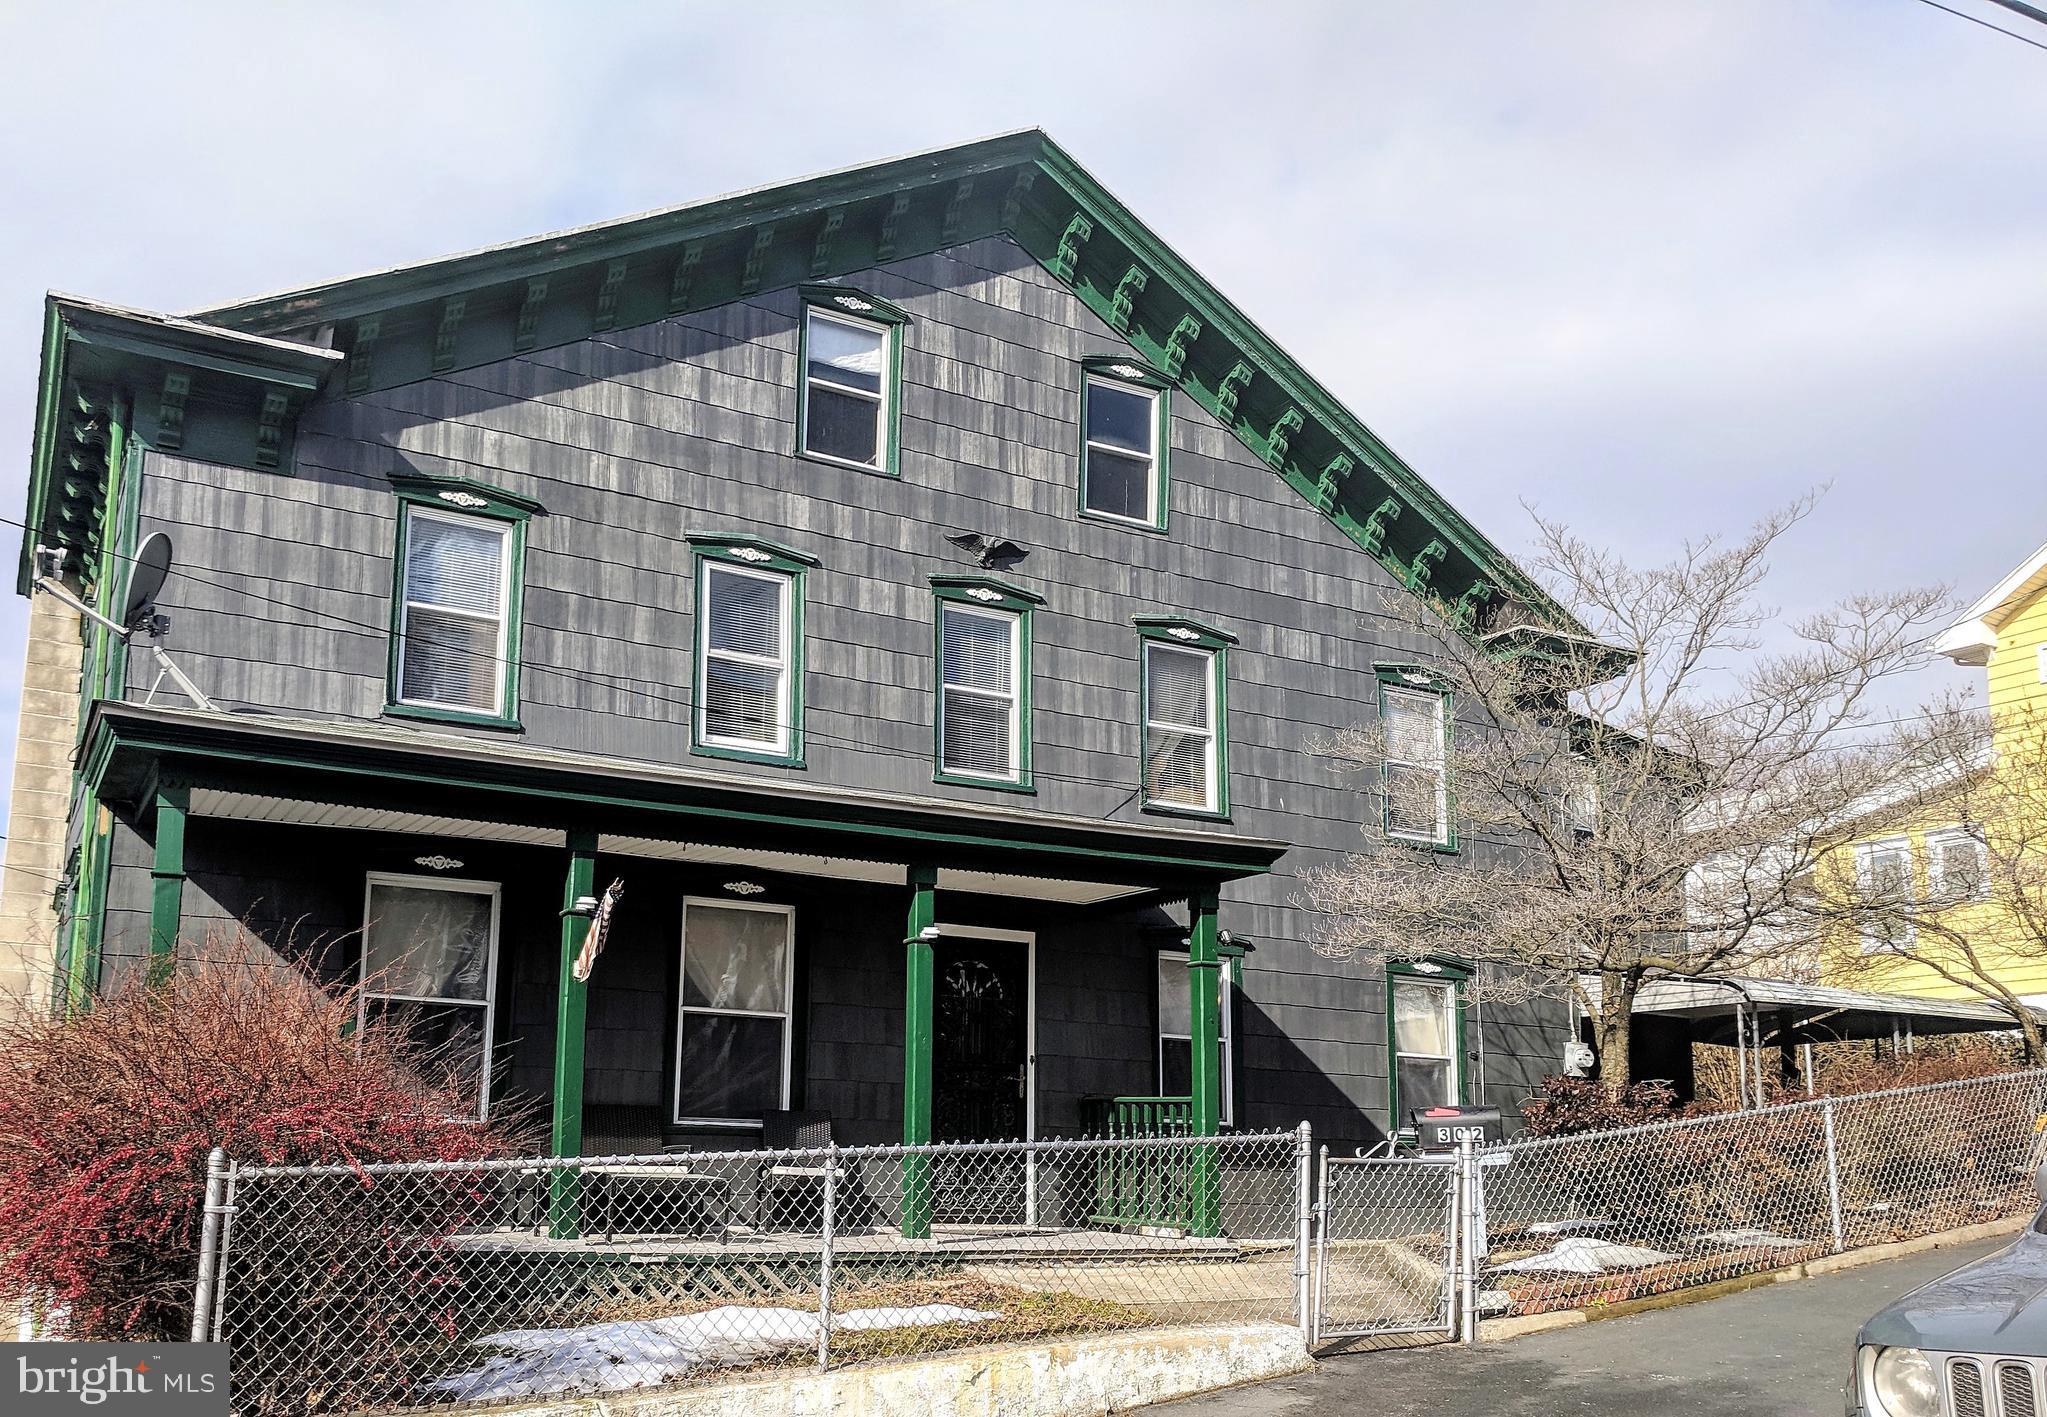 302 N 2ND STREET, MINERSVILLE, PA 17954